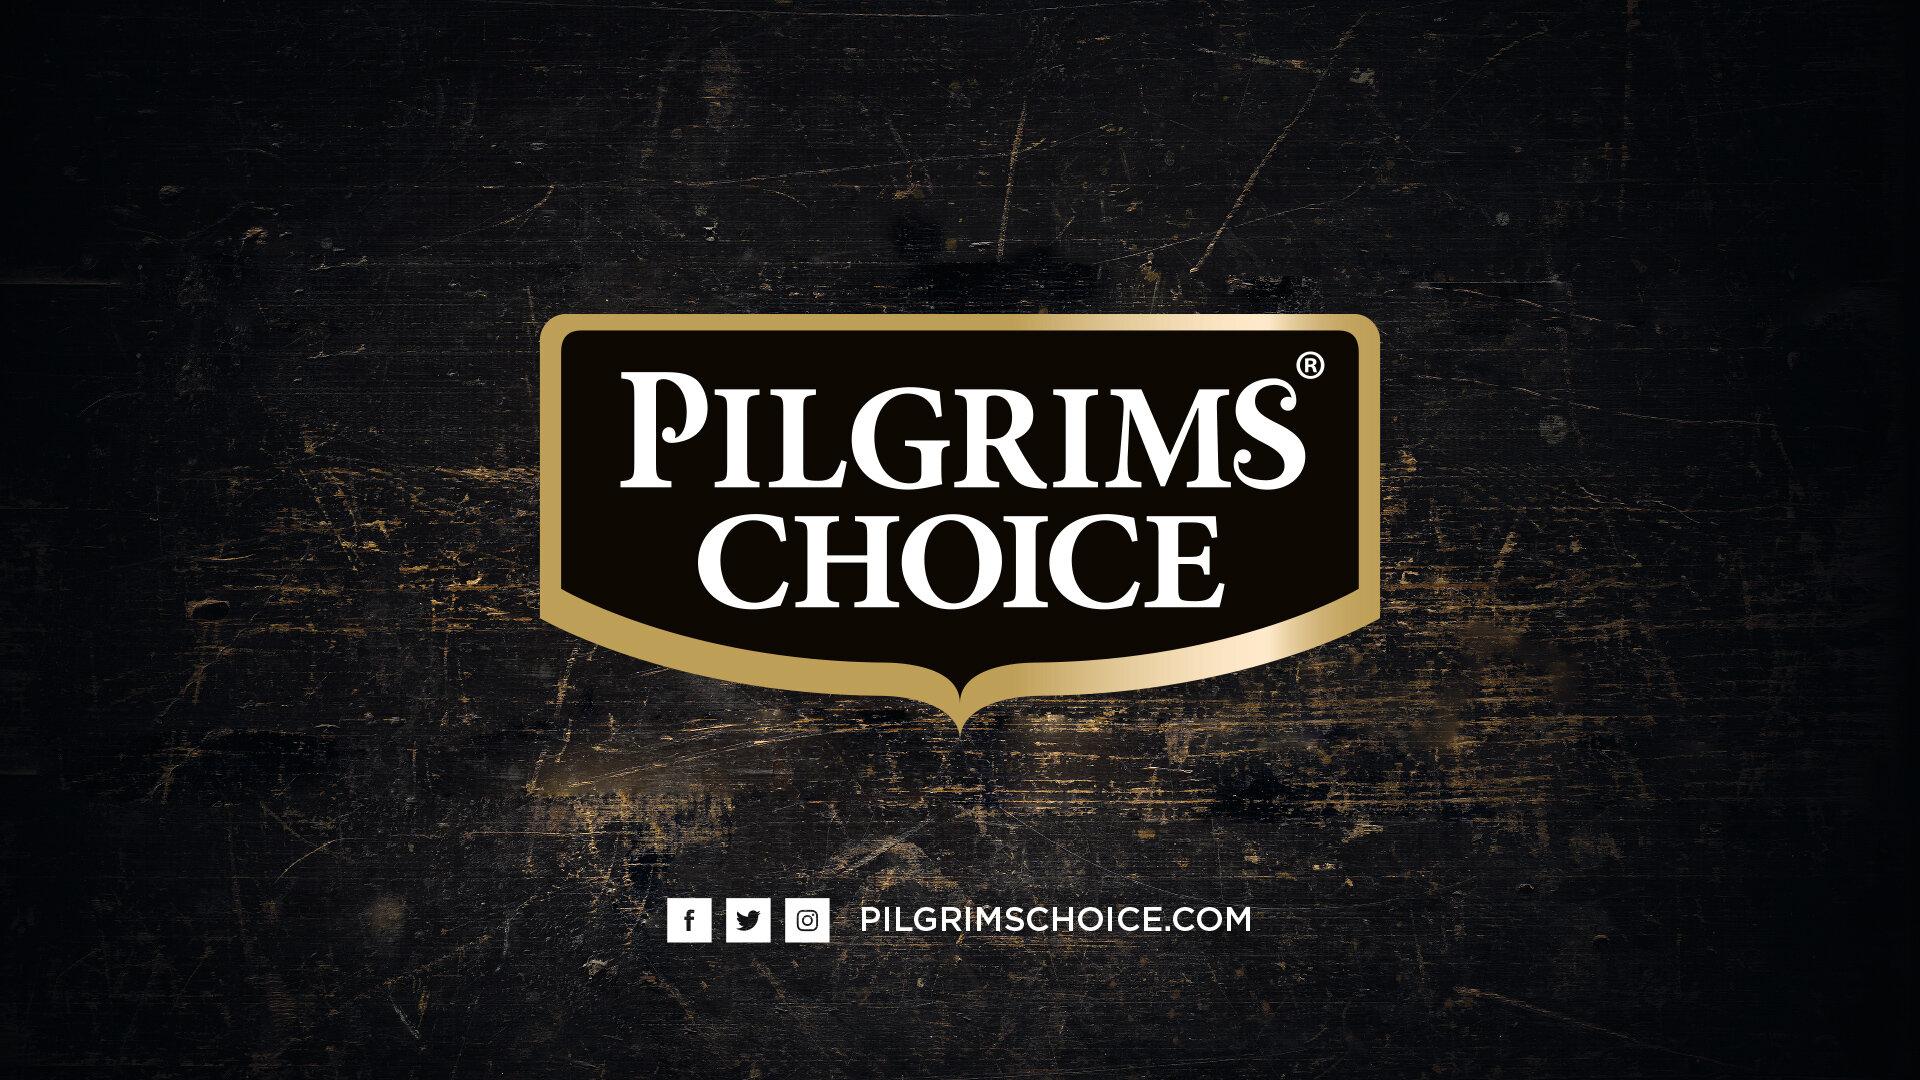 Pilgrims Choice Logo Shot   Manchester Video Produciton Company   Dead Pixel Films